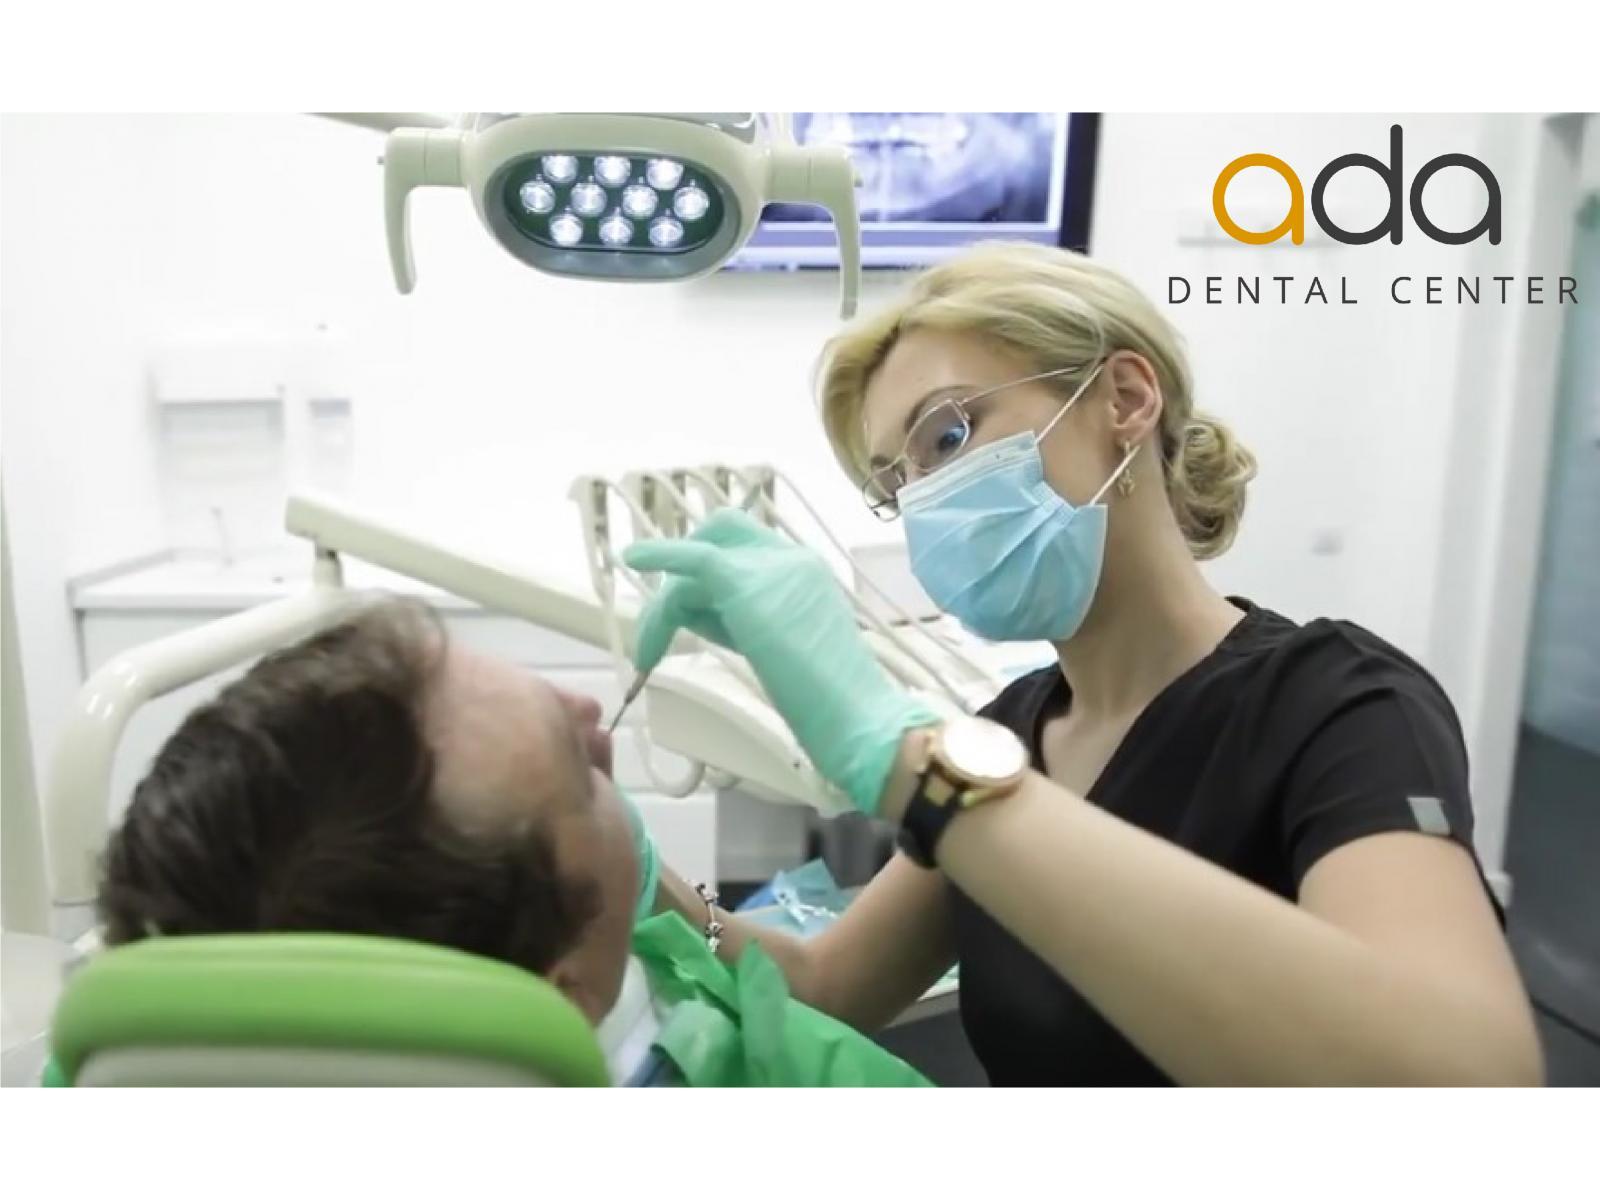 Ada Dental Center - parodontologie1.jpg